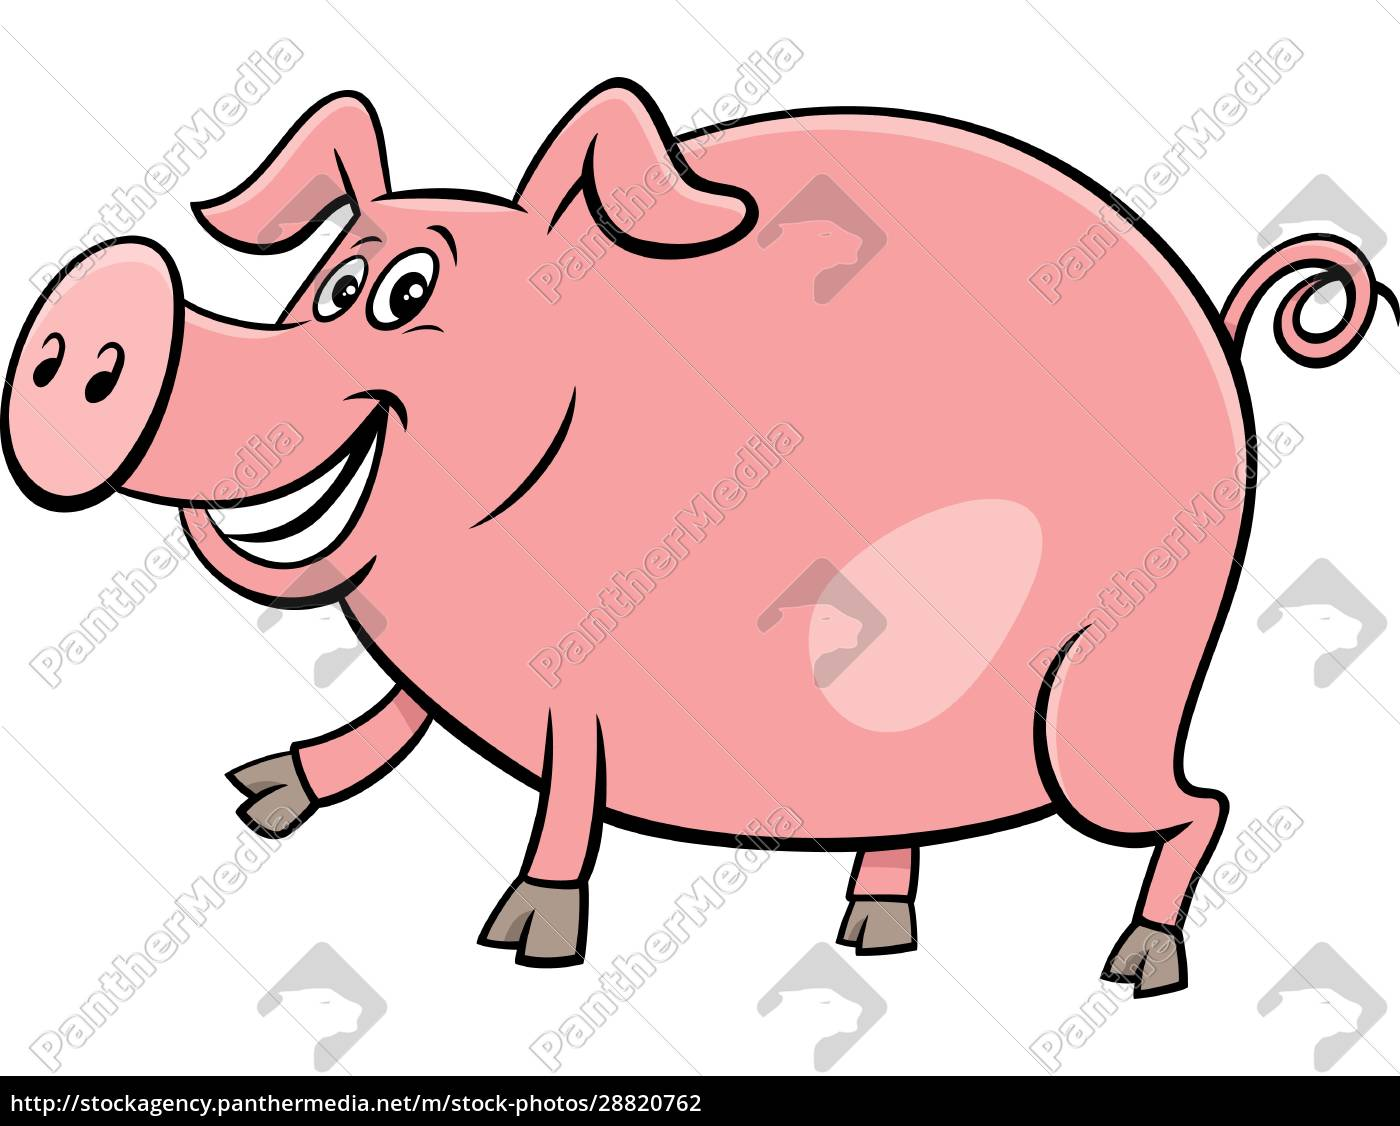 happy, pig, farm, animal, character, cartoon - 28820762